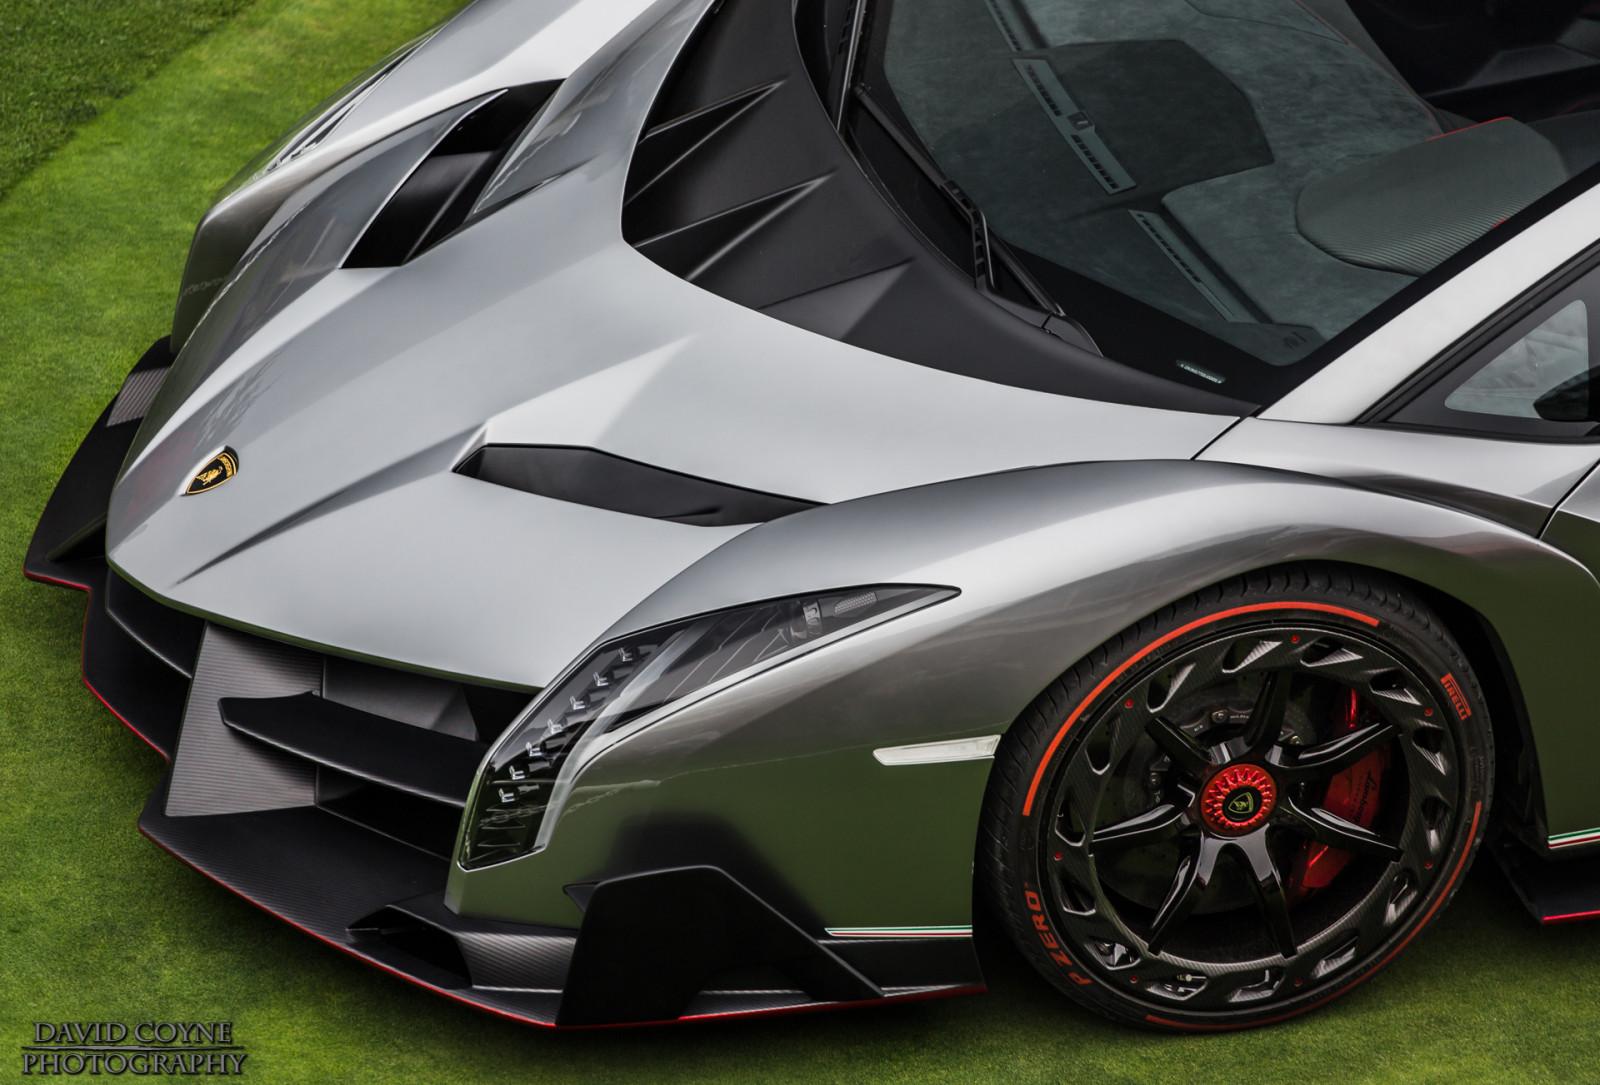 Sport Car Wallpaper Tumblr: Wallpaper : Italy, Photography, Lamborghini Aventador